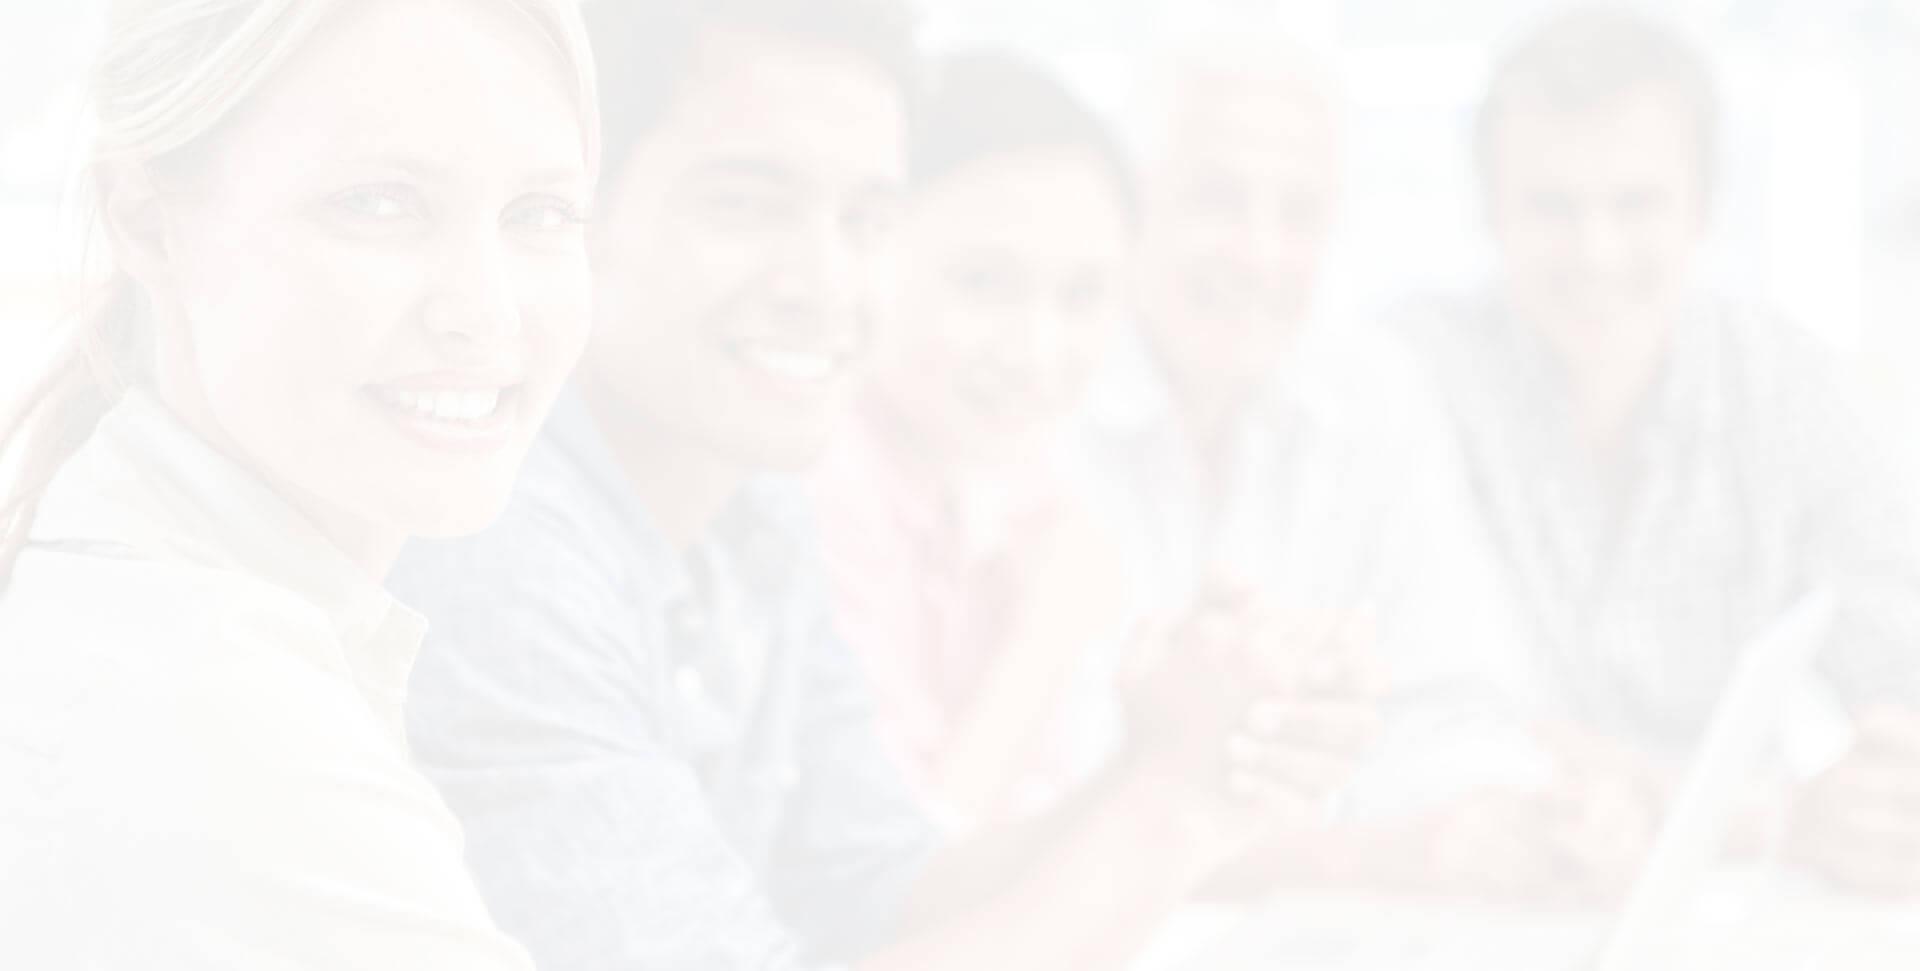 IT Careers | Information Technology Jobs | DynTek, Inc